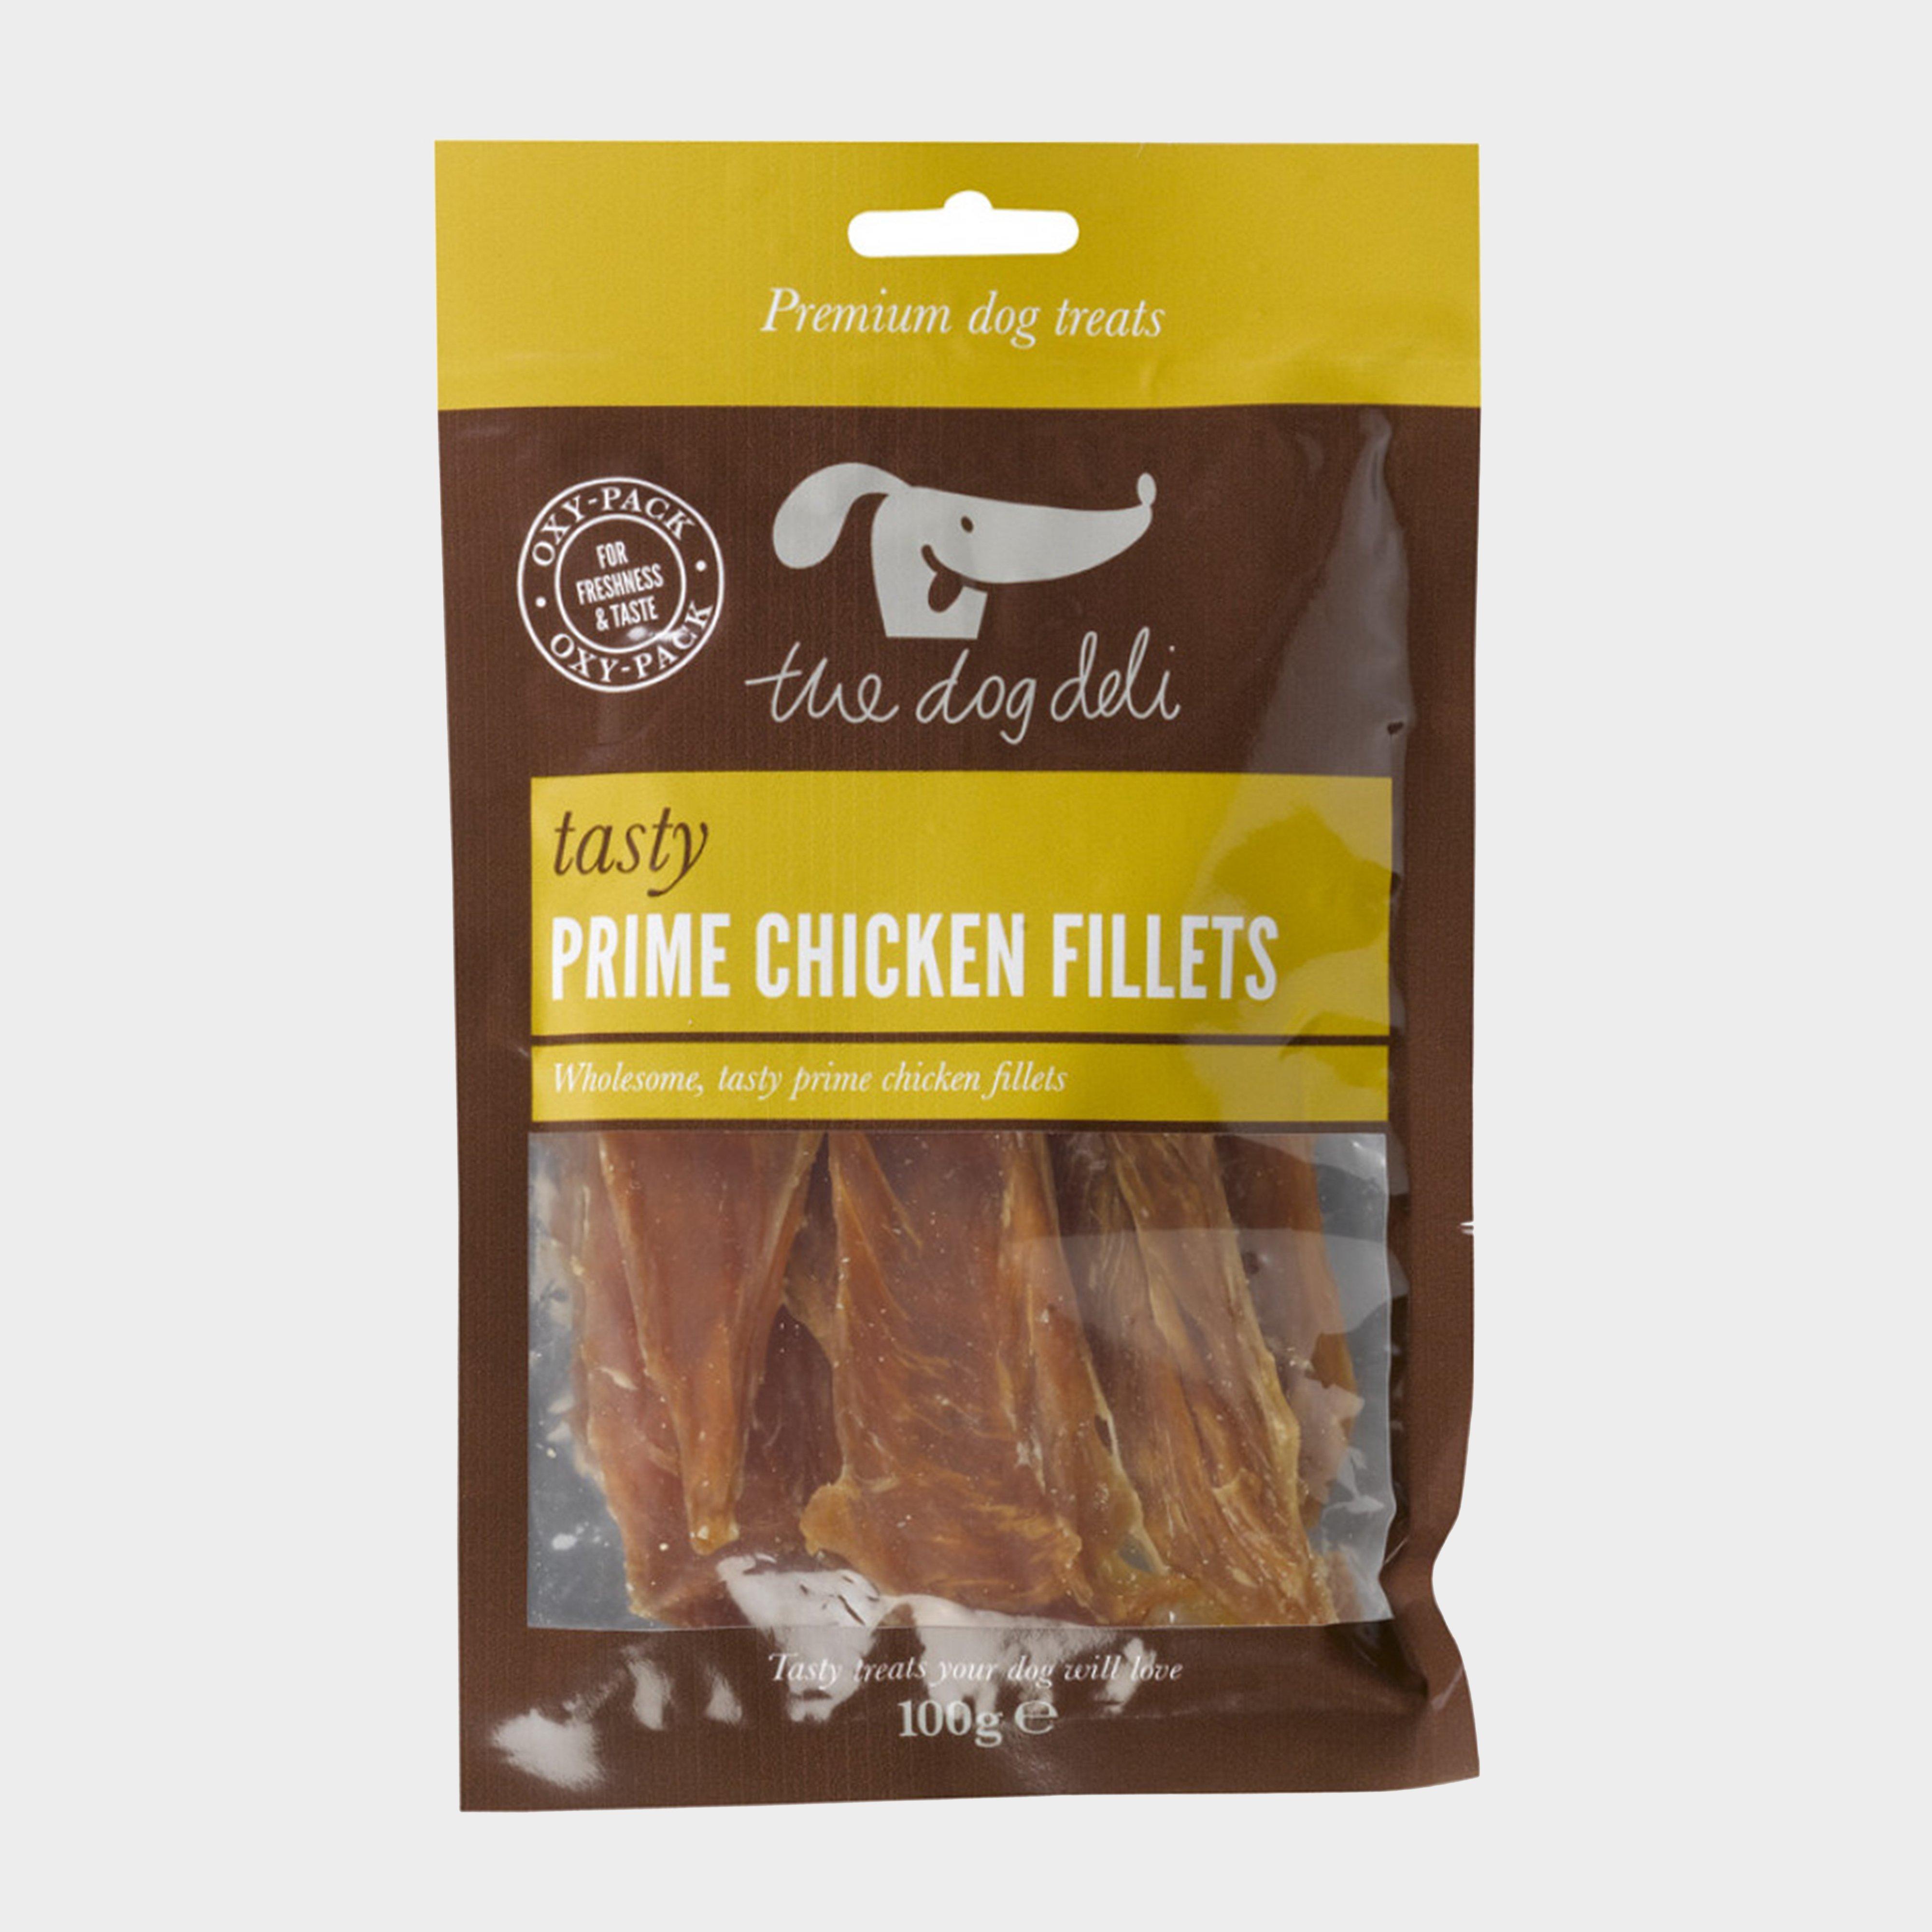 Image of Petface Dog Deli Prime Chicken Fillets 100G - No Colour/No Colour, No colour/No Colour